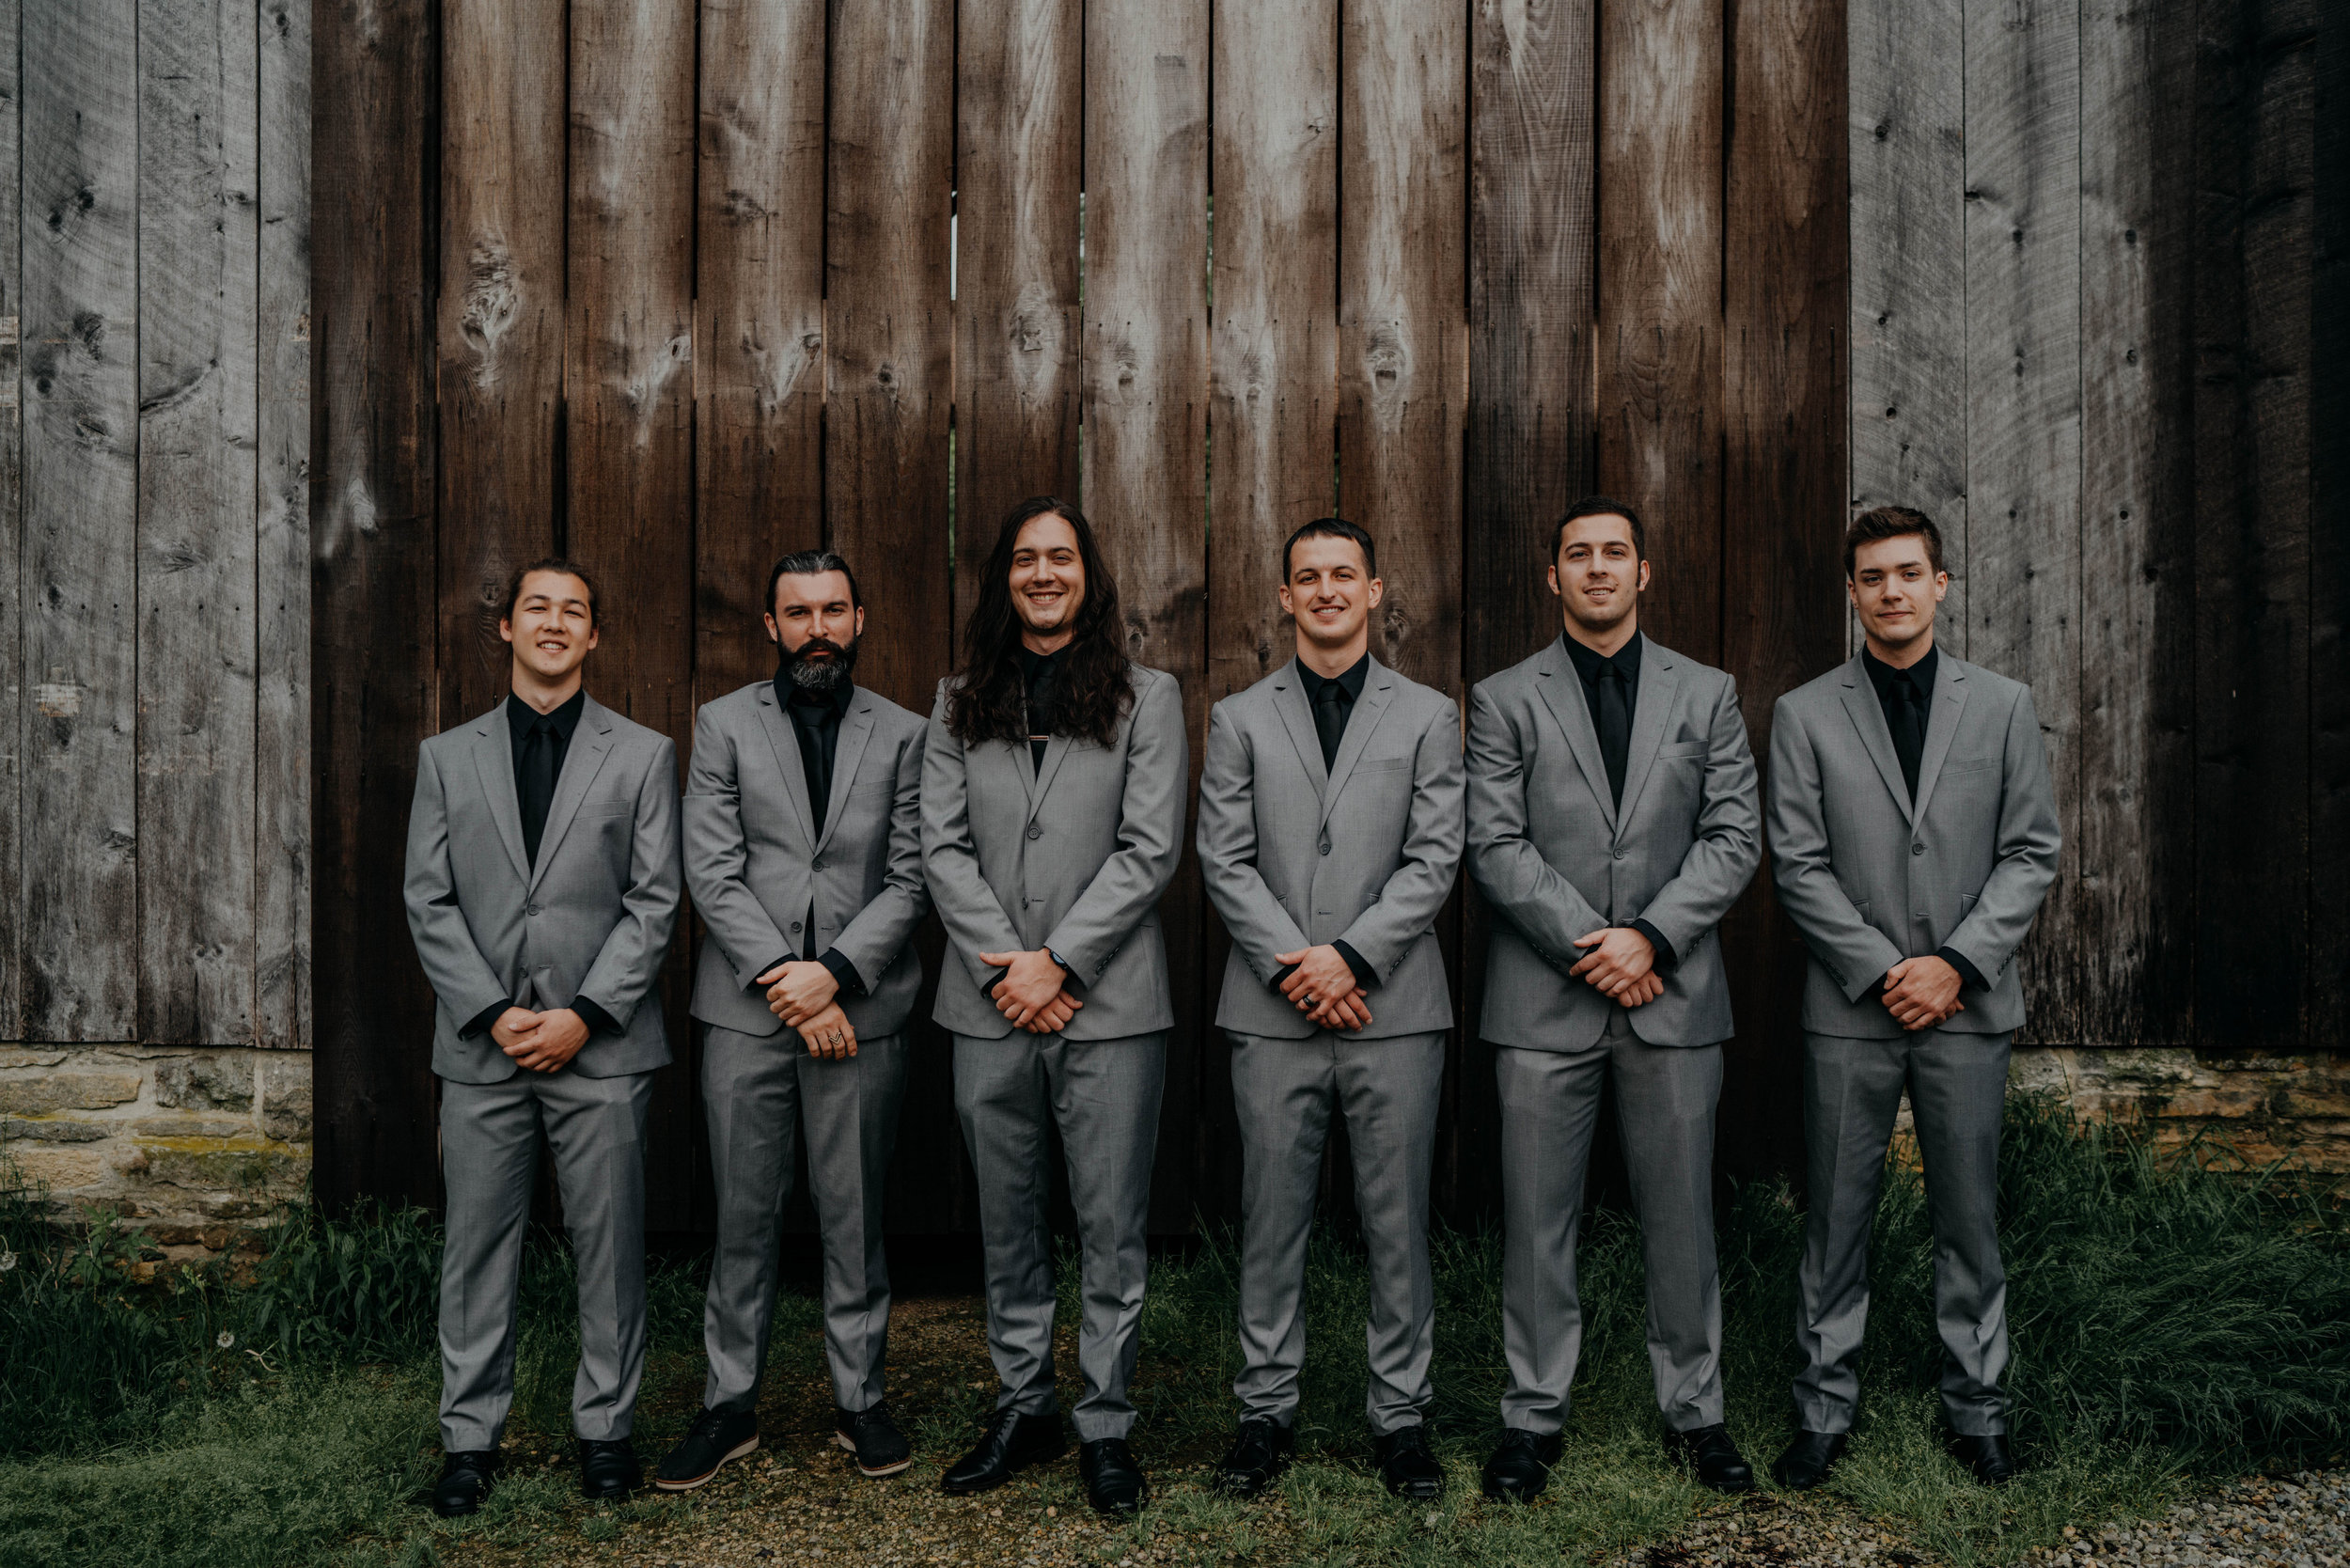 Columbus ohio wedding photographer canyon run ranch wedding grace e jones photography wedding photographer102.jpg